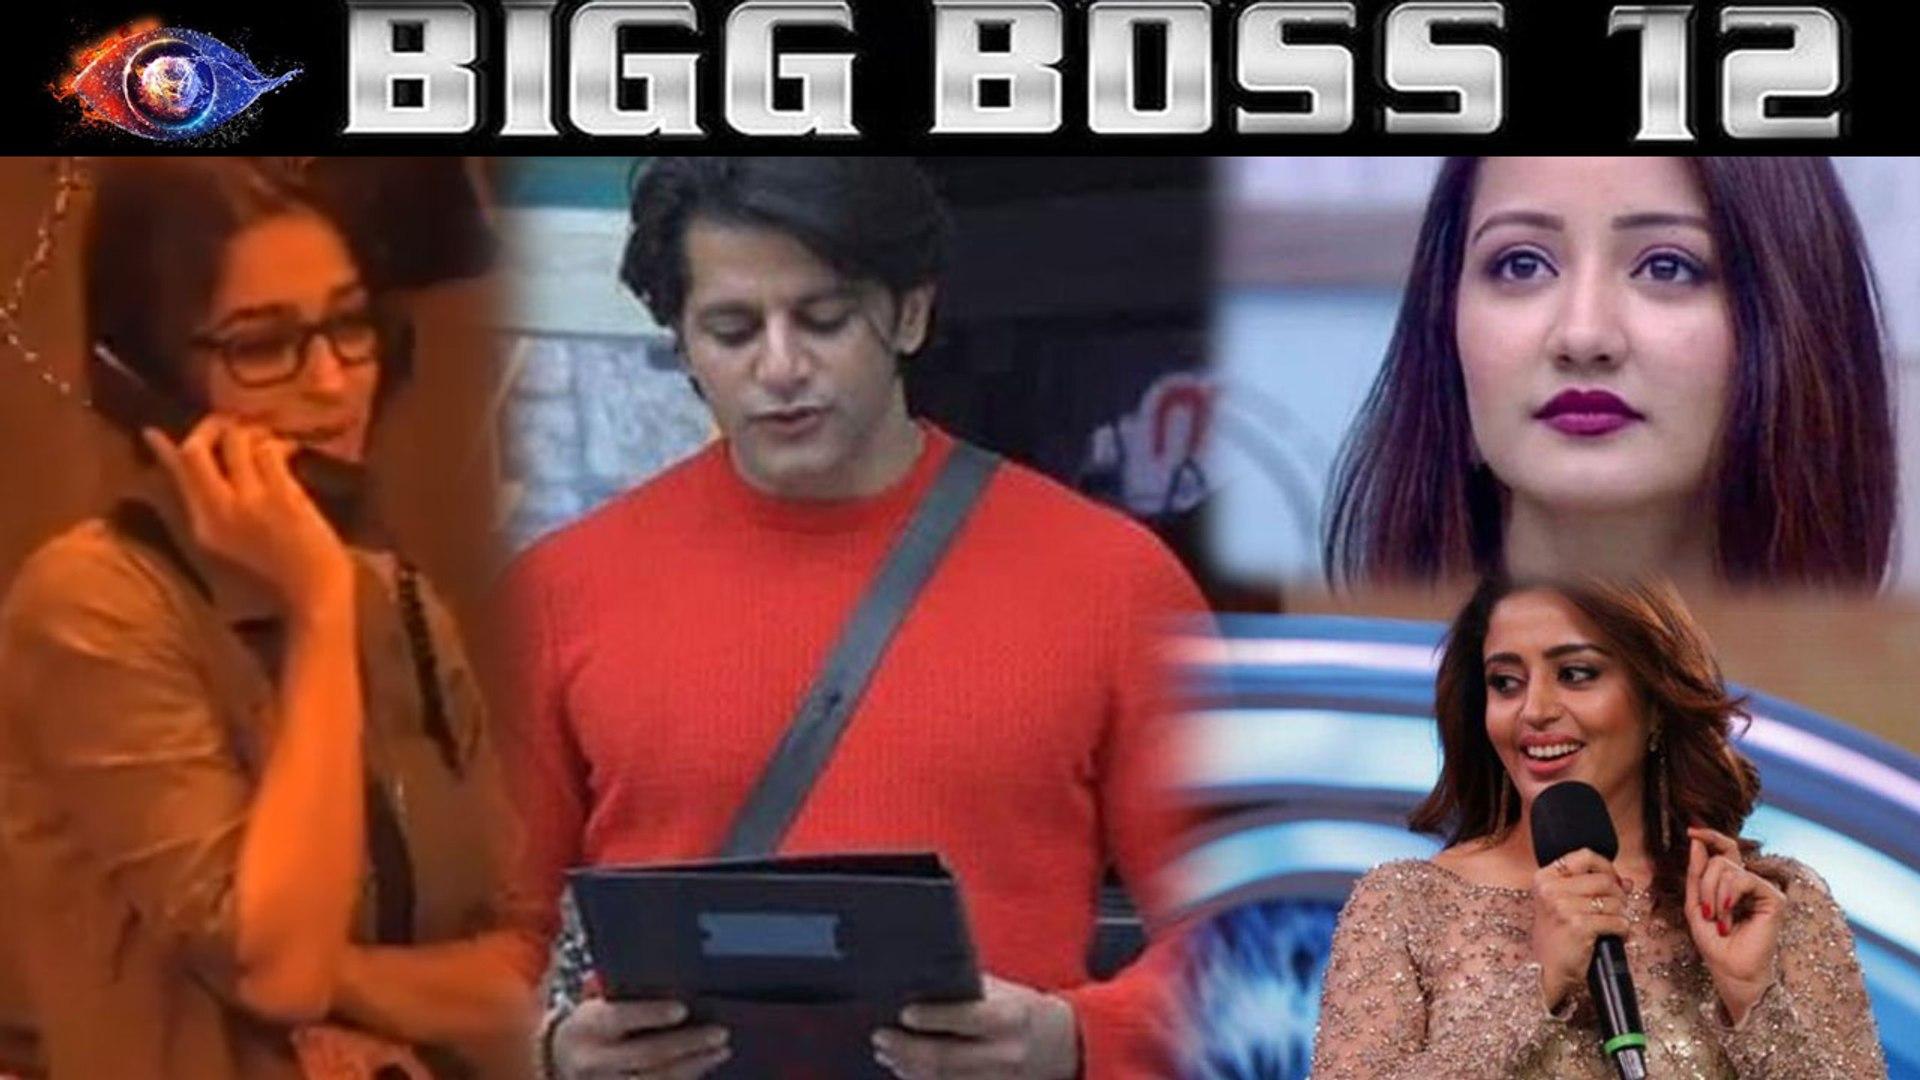 Bigg Boss 12: Real Life Partner of BB12 contestants | FilmiBeat